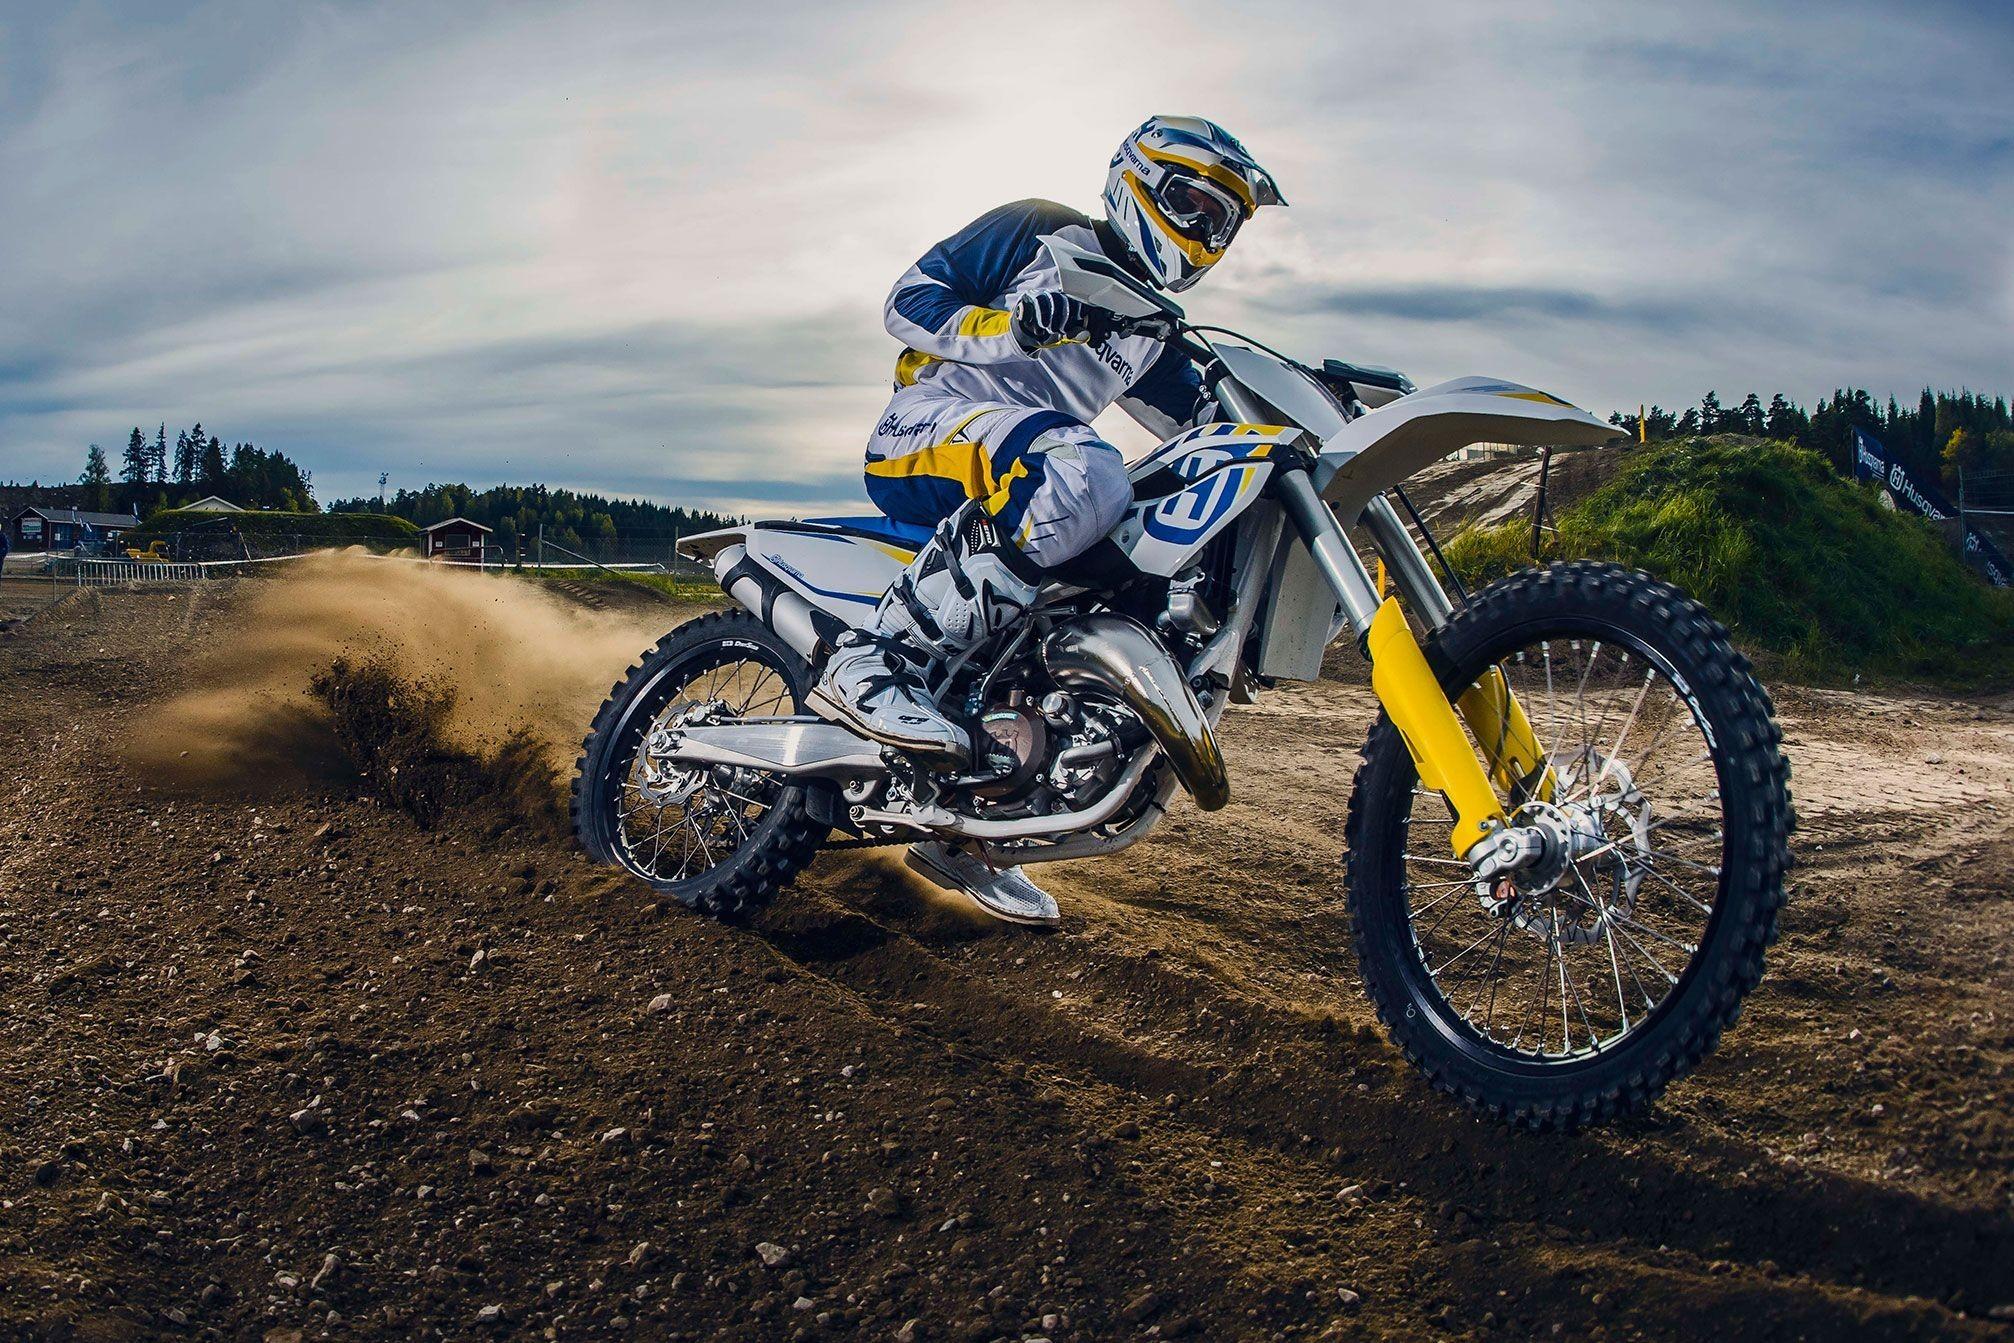 2015x1341 2015 Kawasaki KX250F Motocross Dirtbike Wallpaper